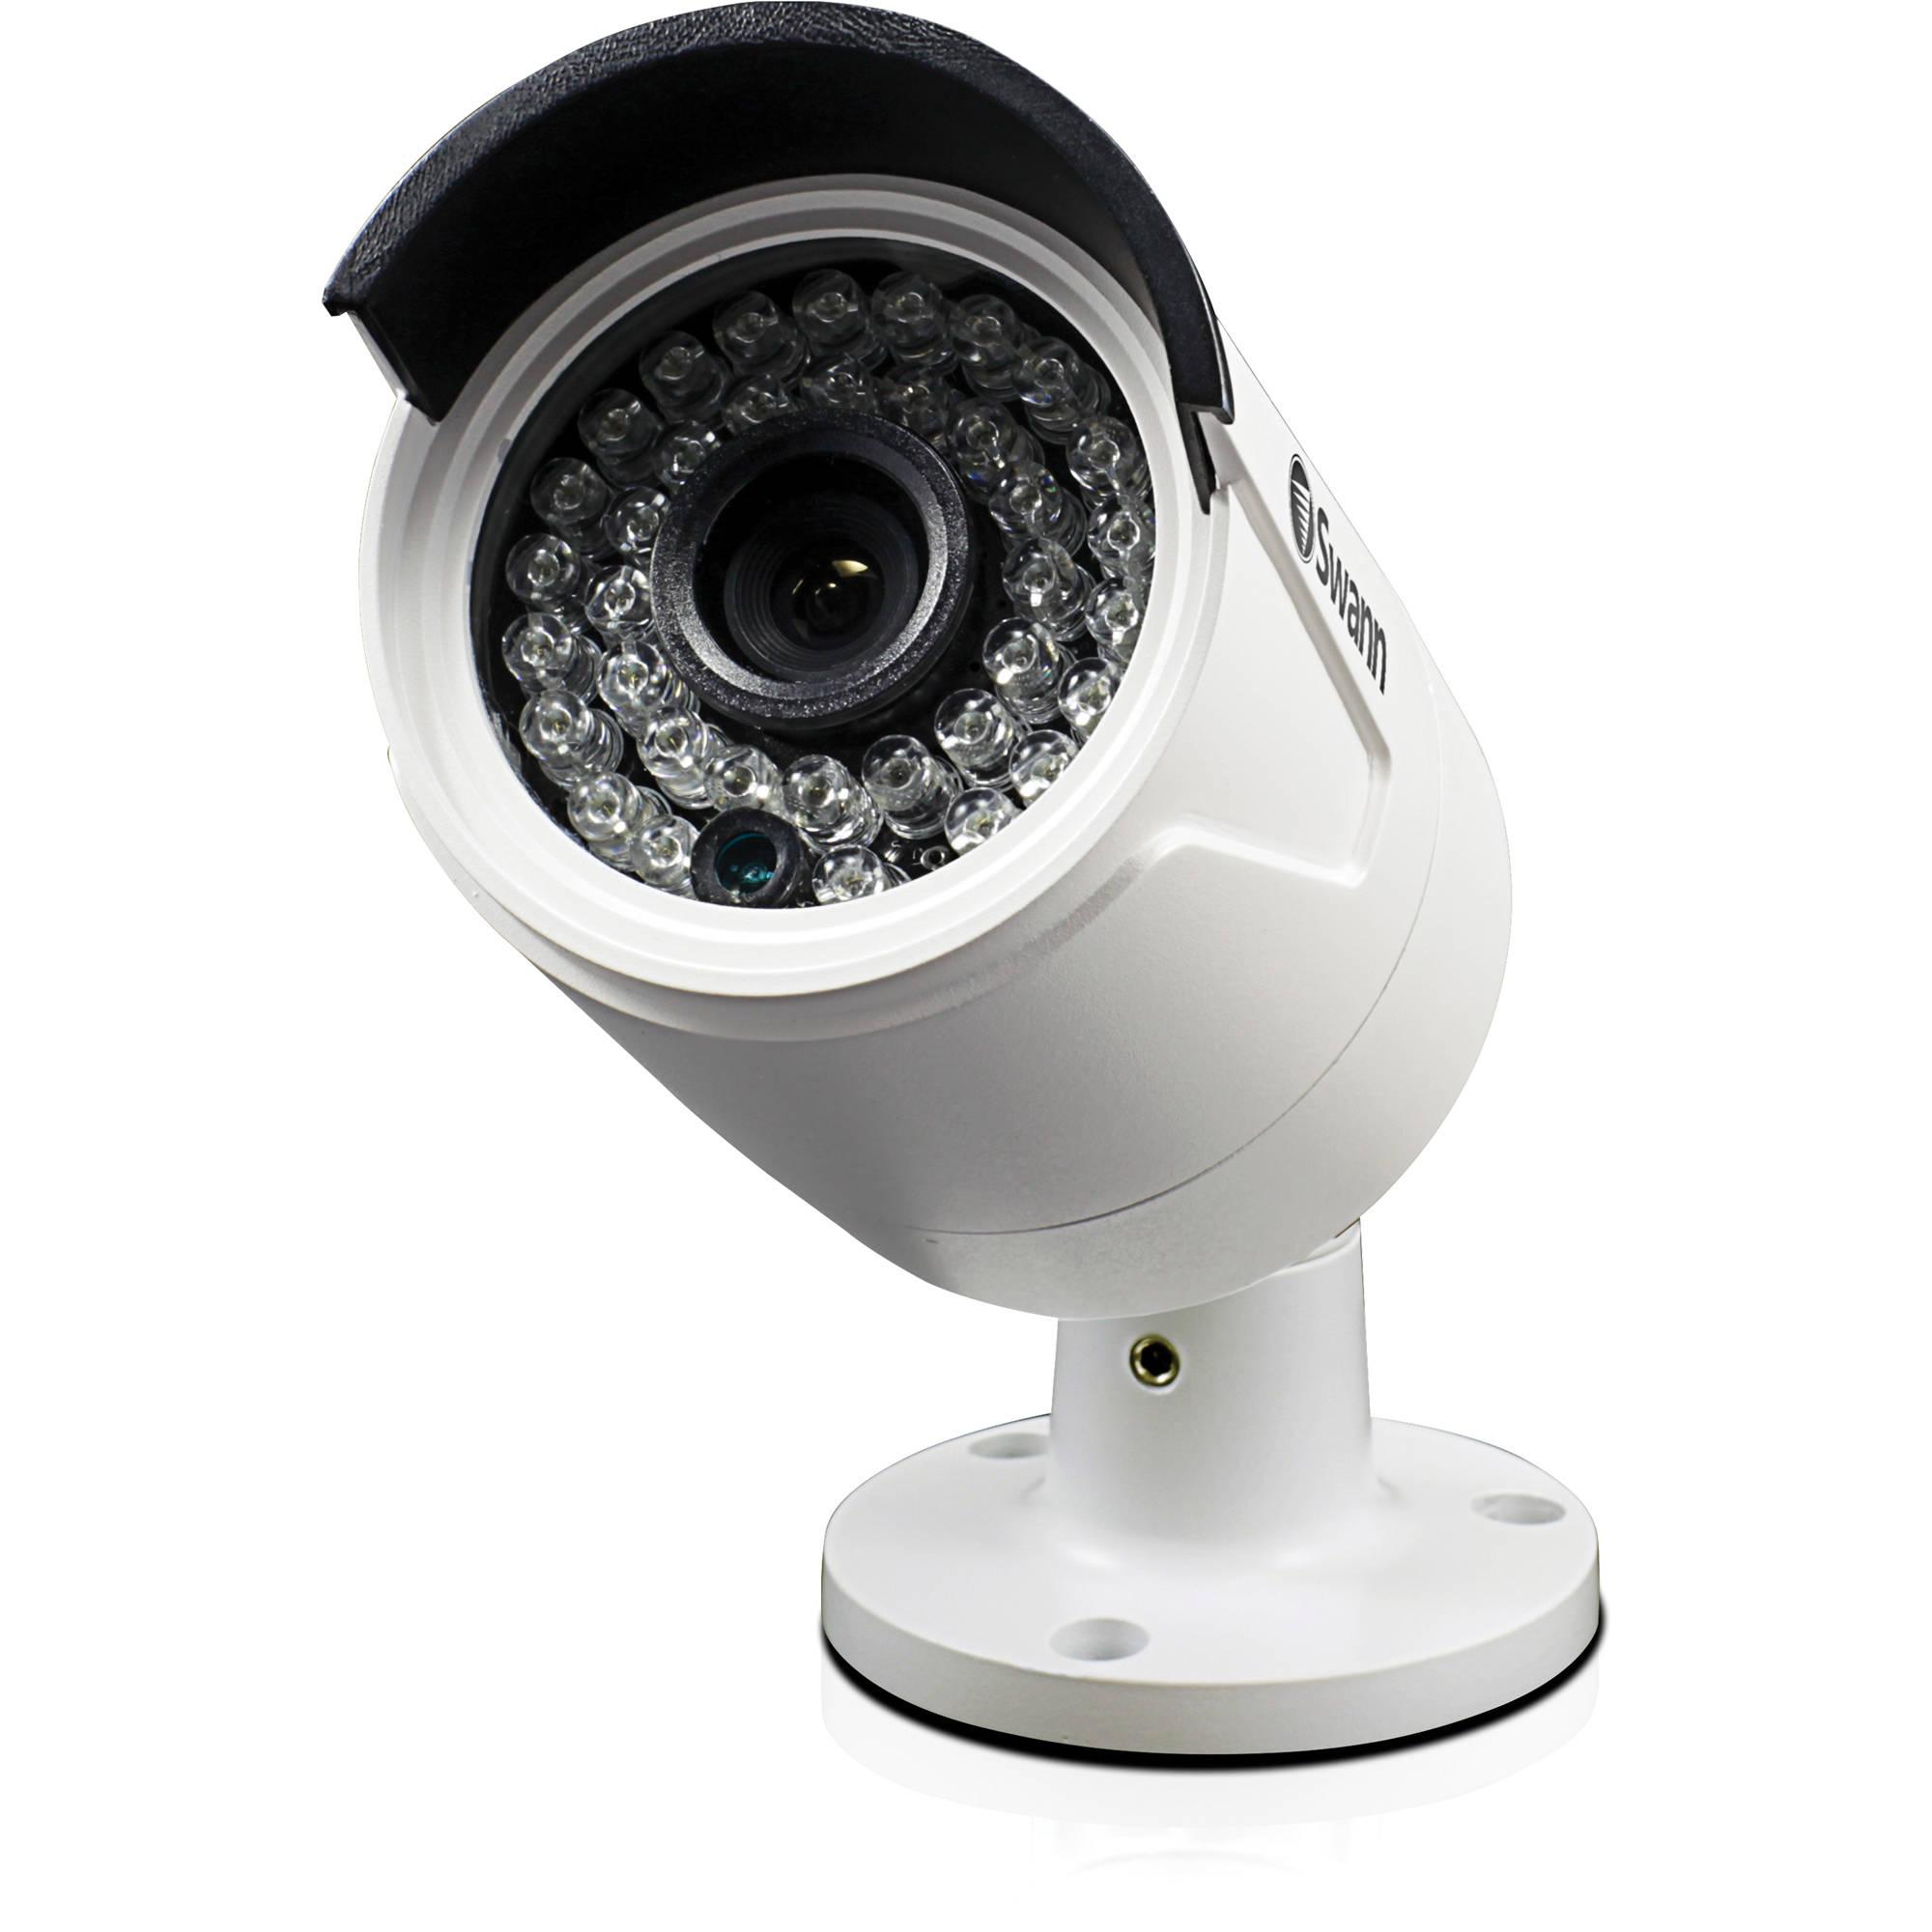 Swann NHD-815 3MP Day/Night IR Network Camera SWNHD-815CAM-US